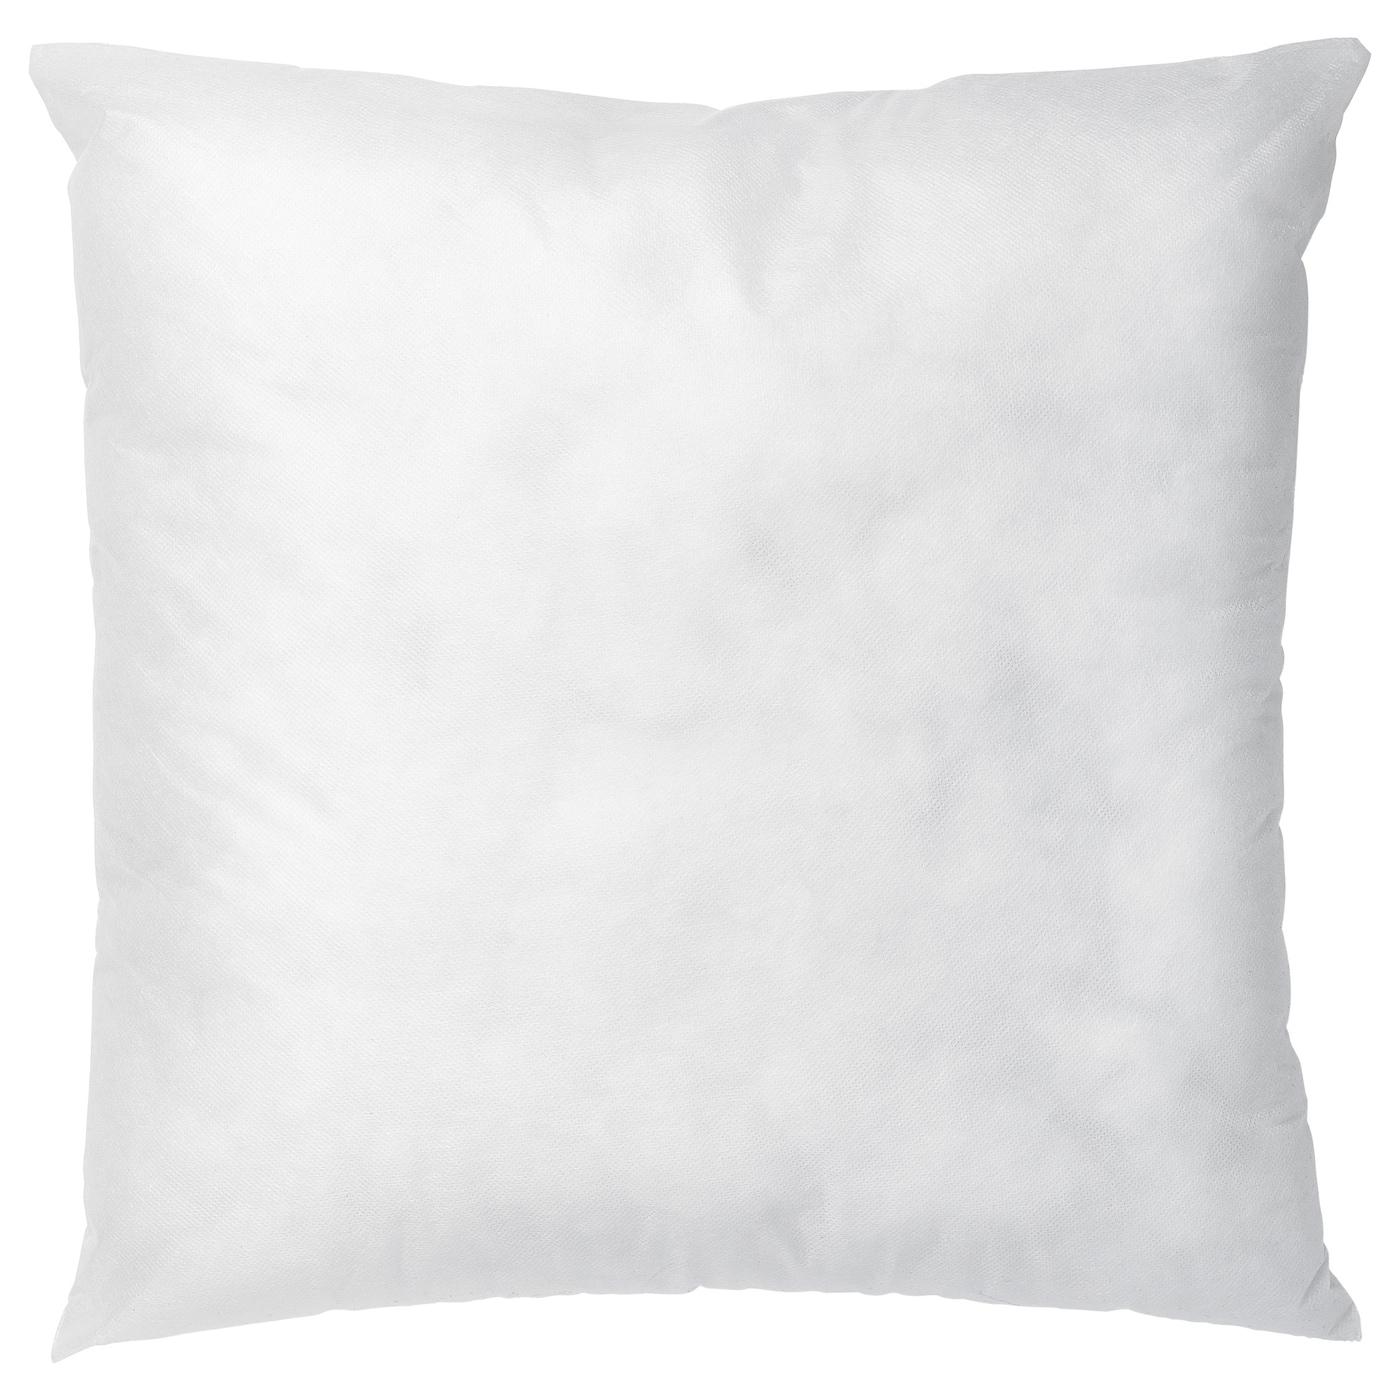 Inner Interno Per Cuscino Bianco 50x50 Cm Ikea It